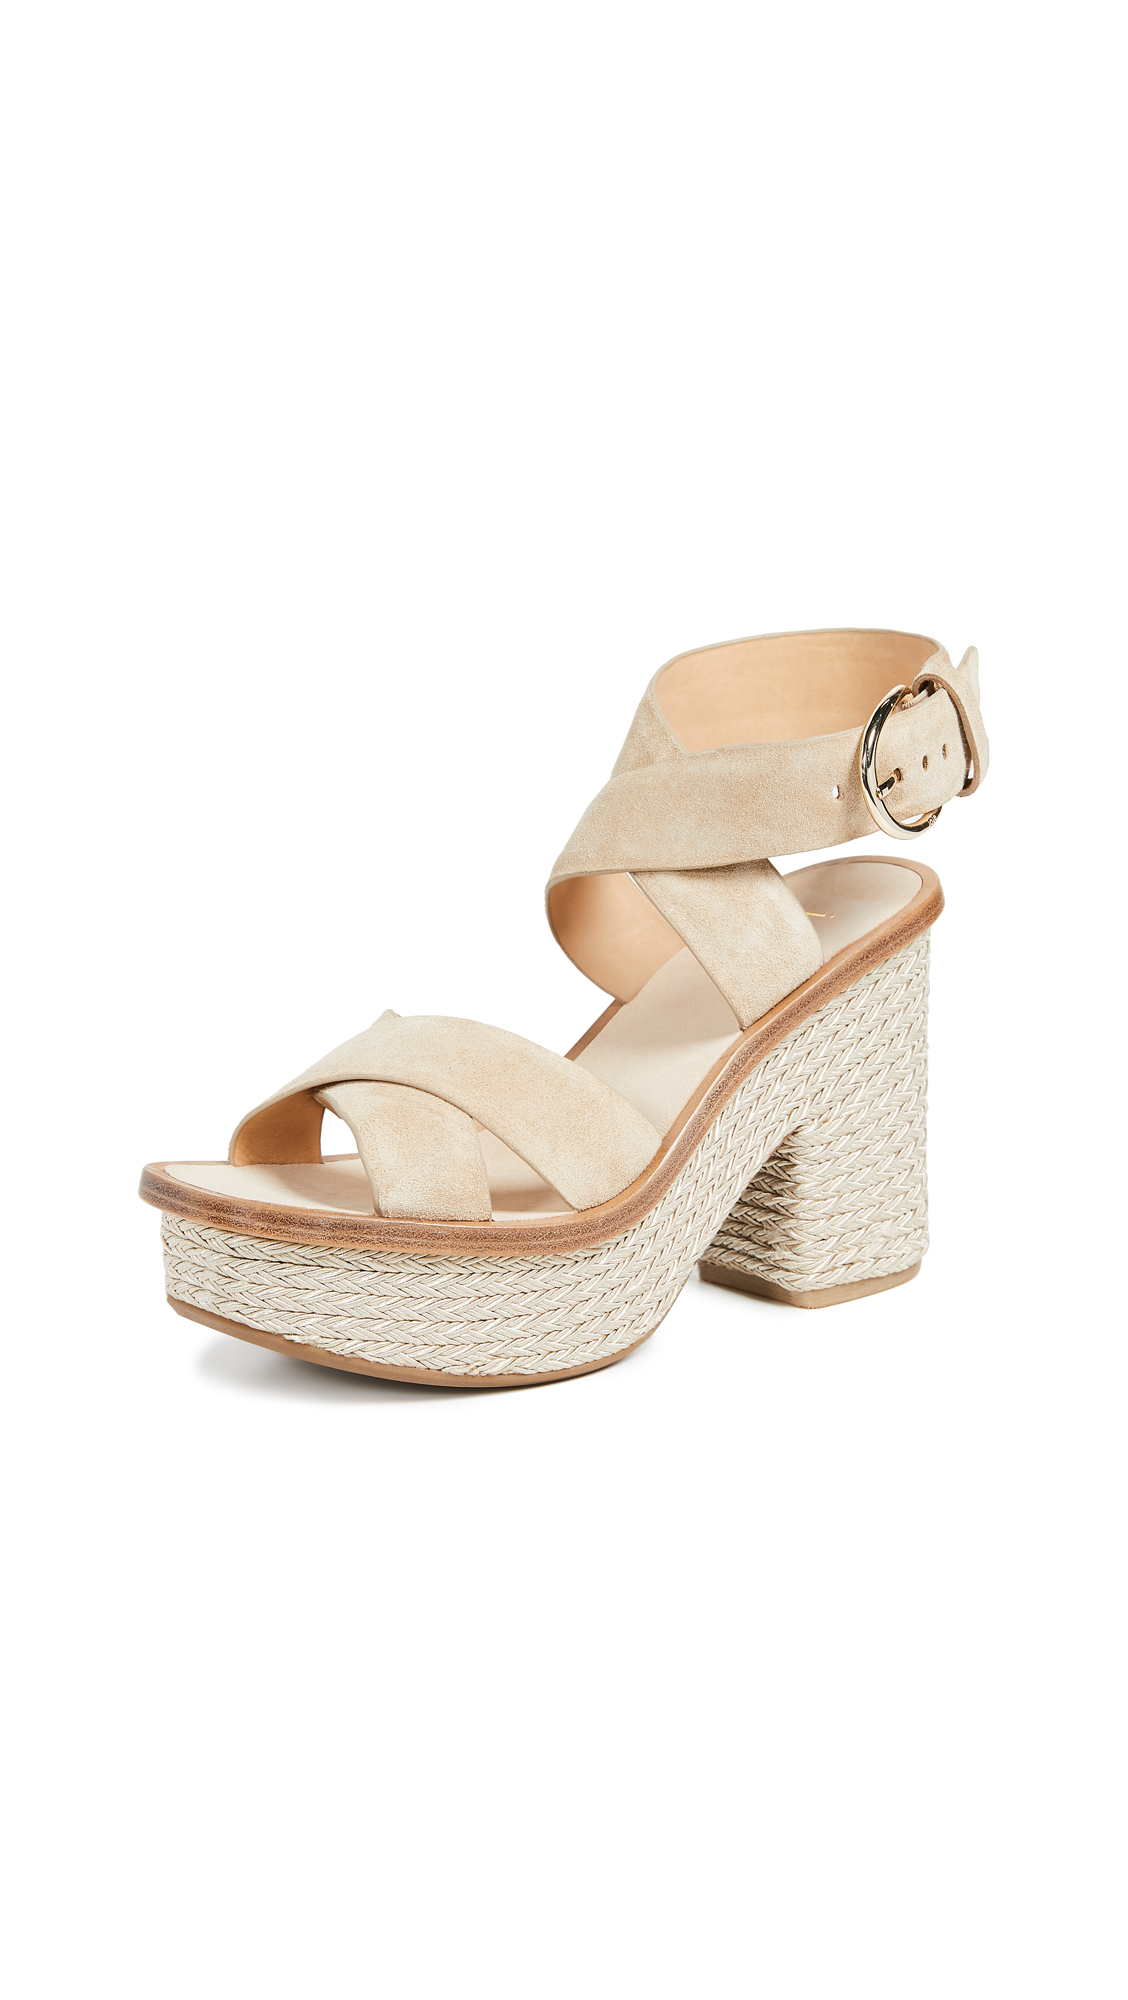 Joie Tanglee Platform Sandals - Sand